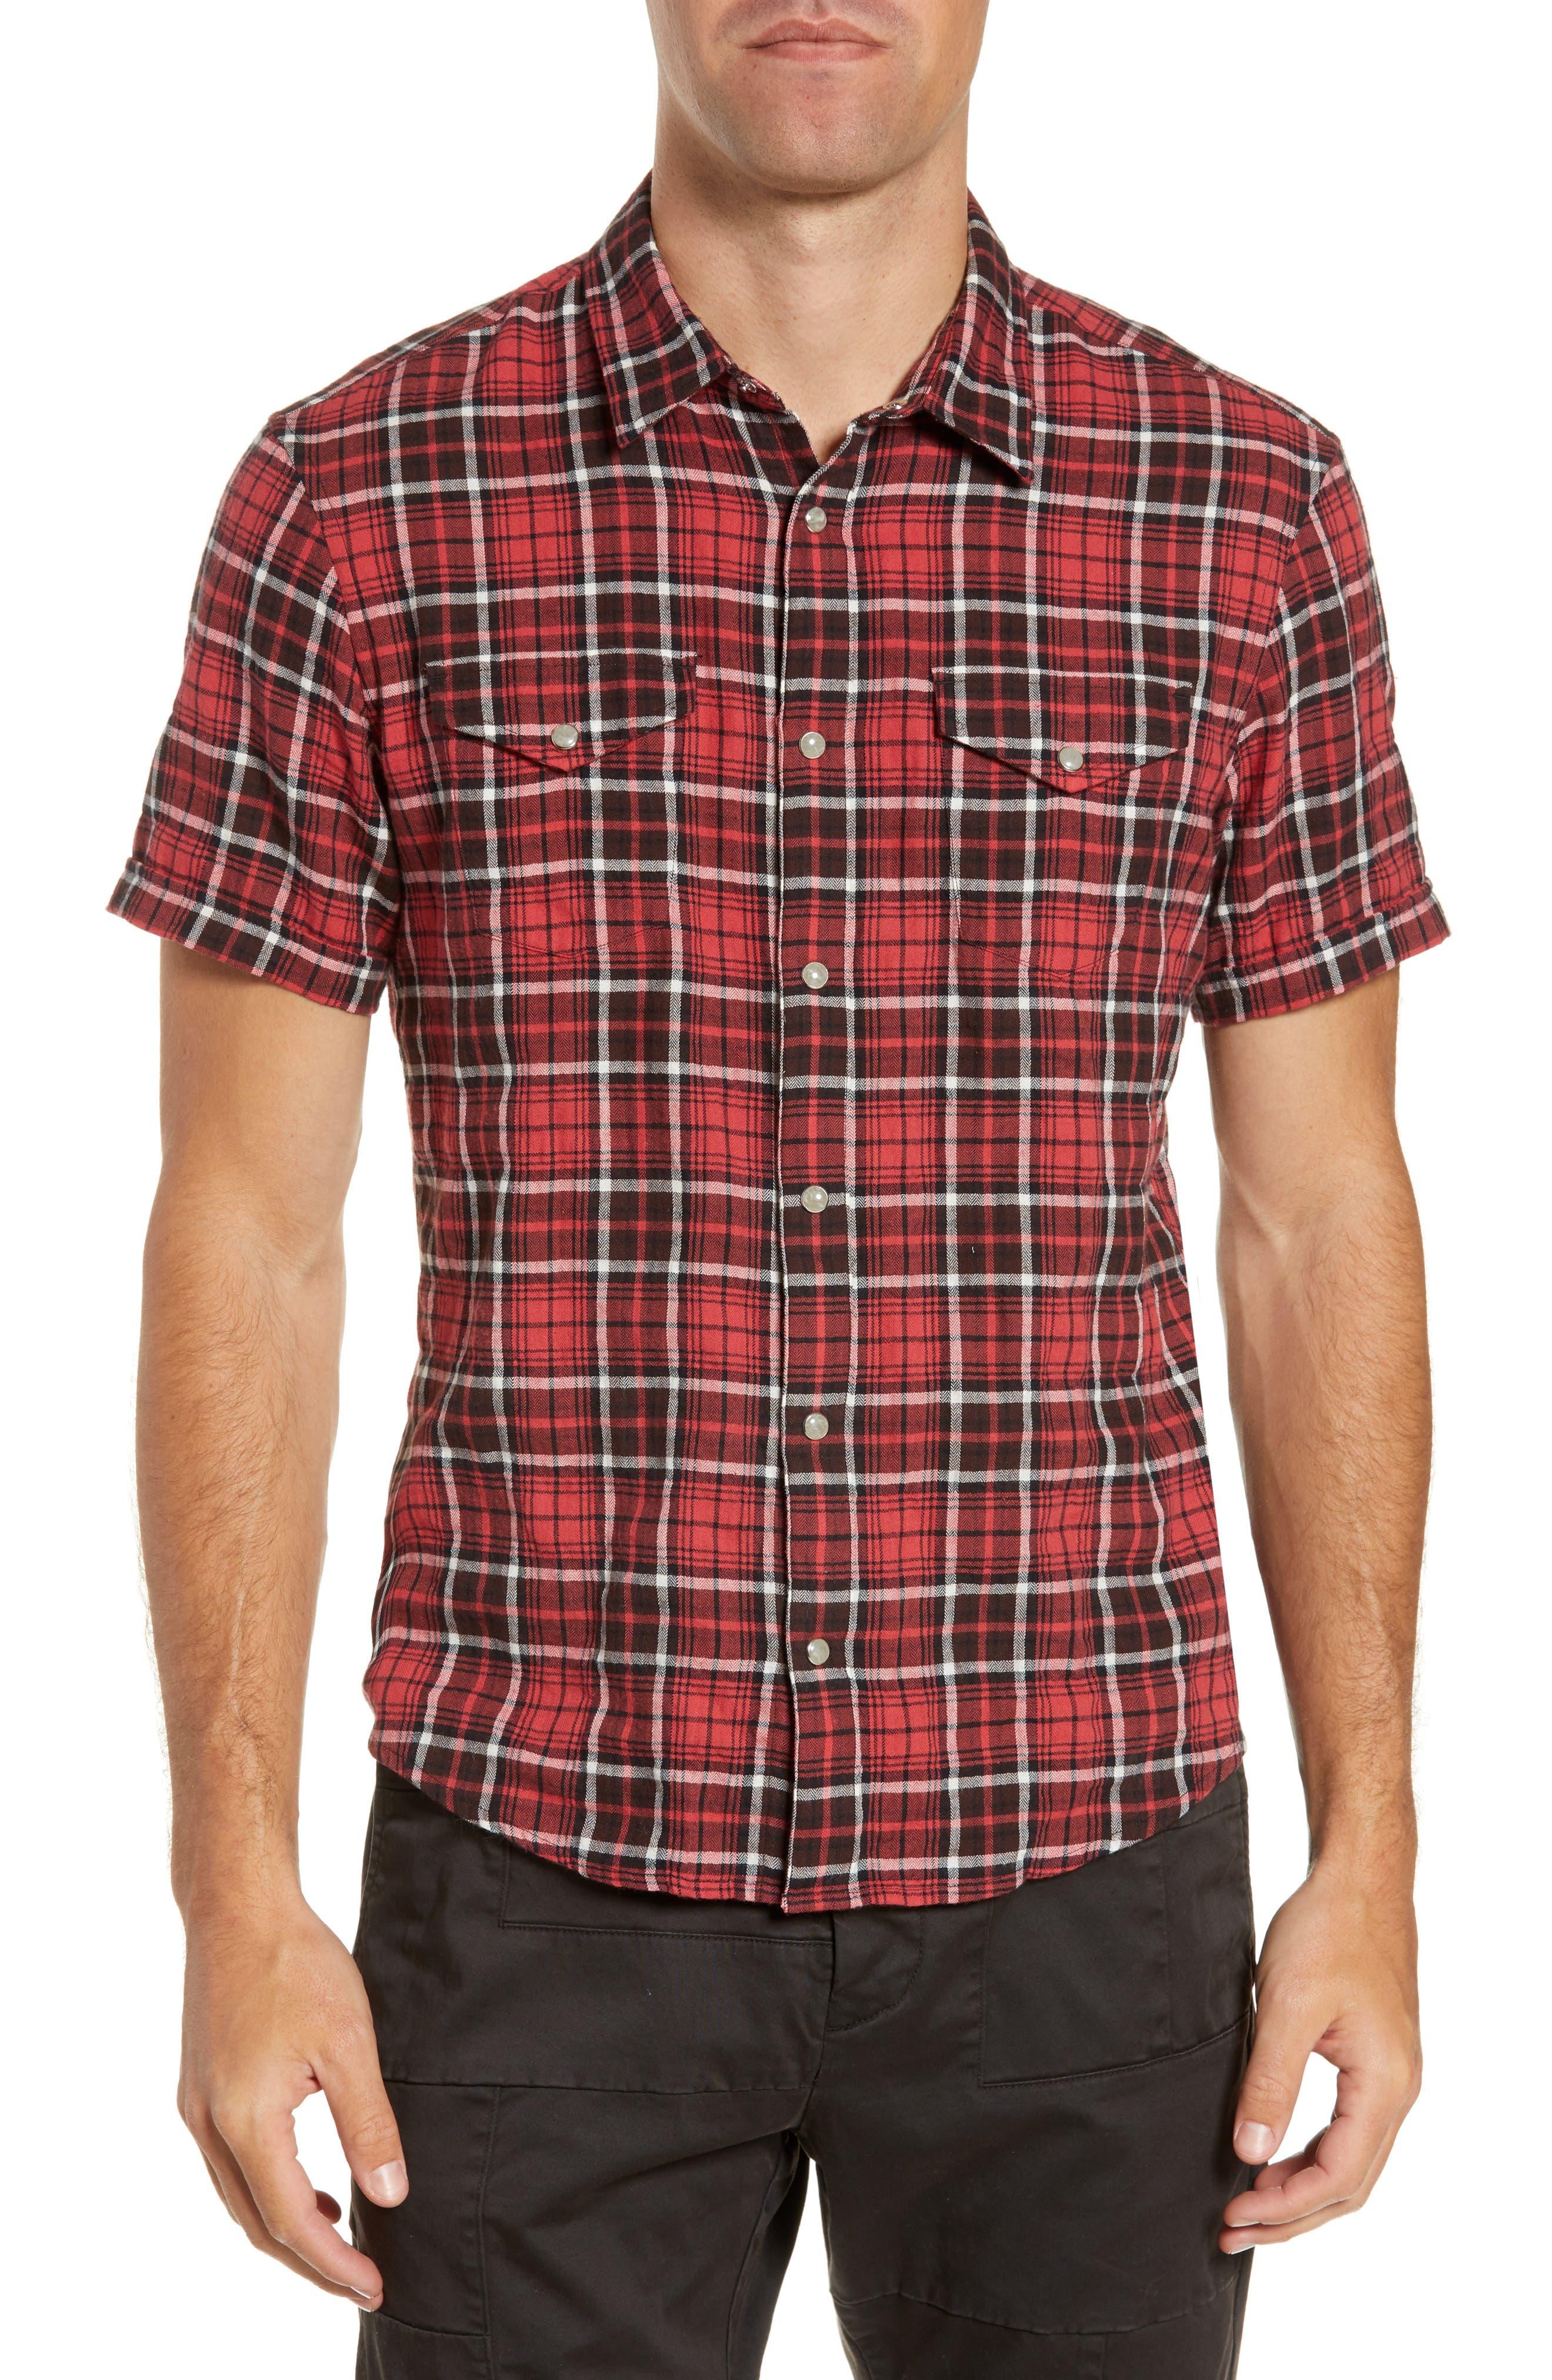 John Varvatos Star Usa Denton Plaid Flannel Sport Shirt, Red